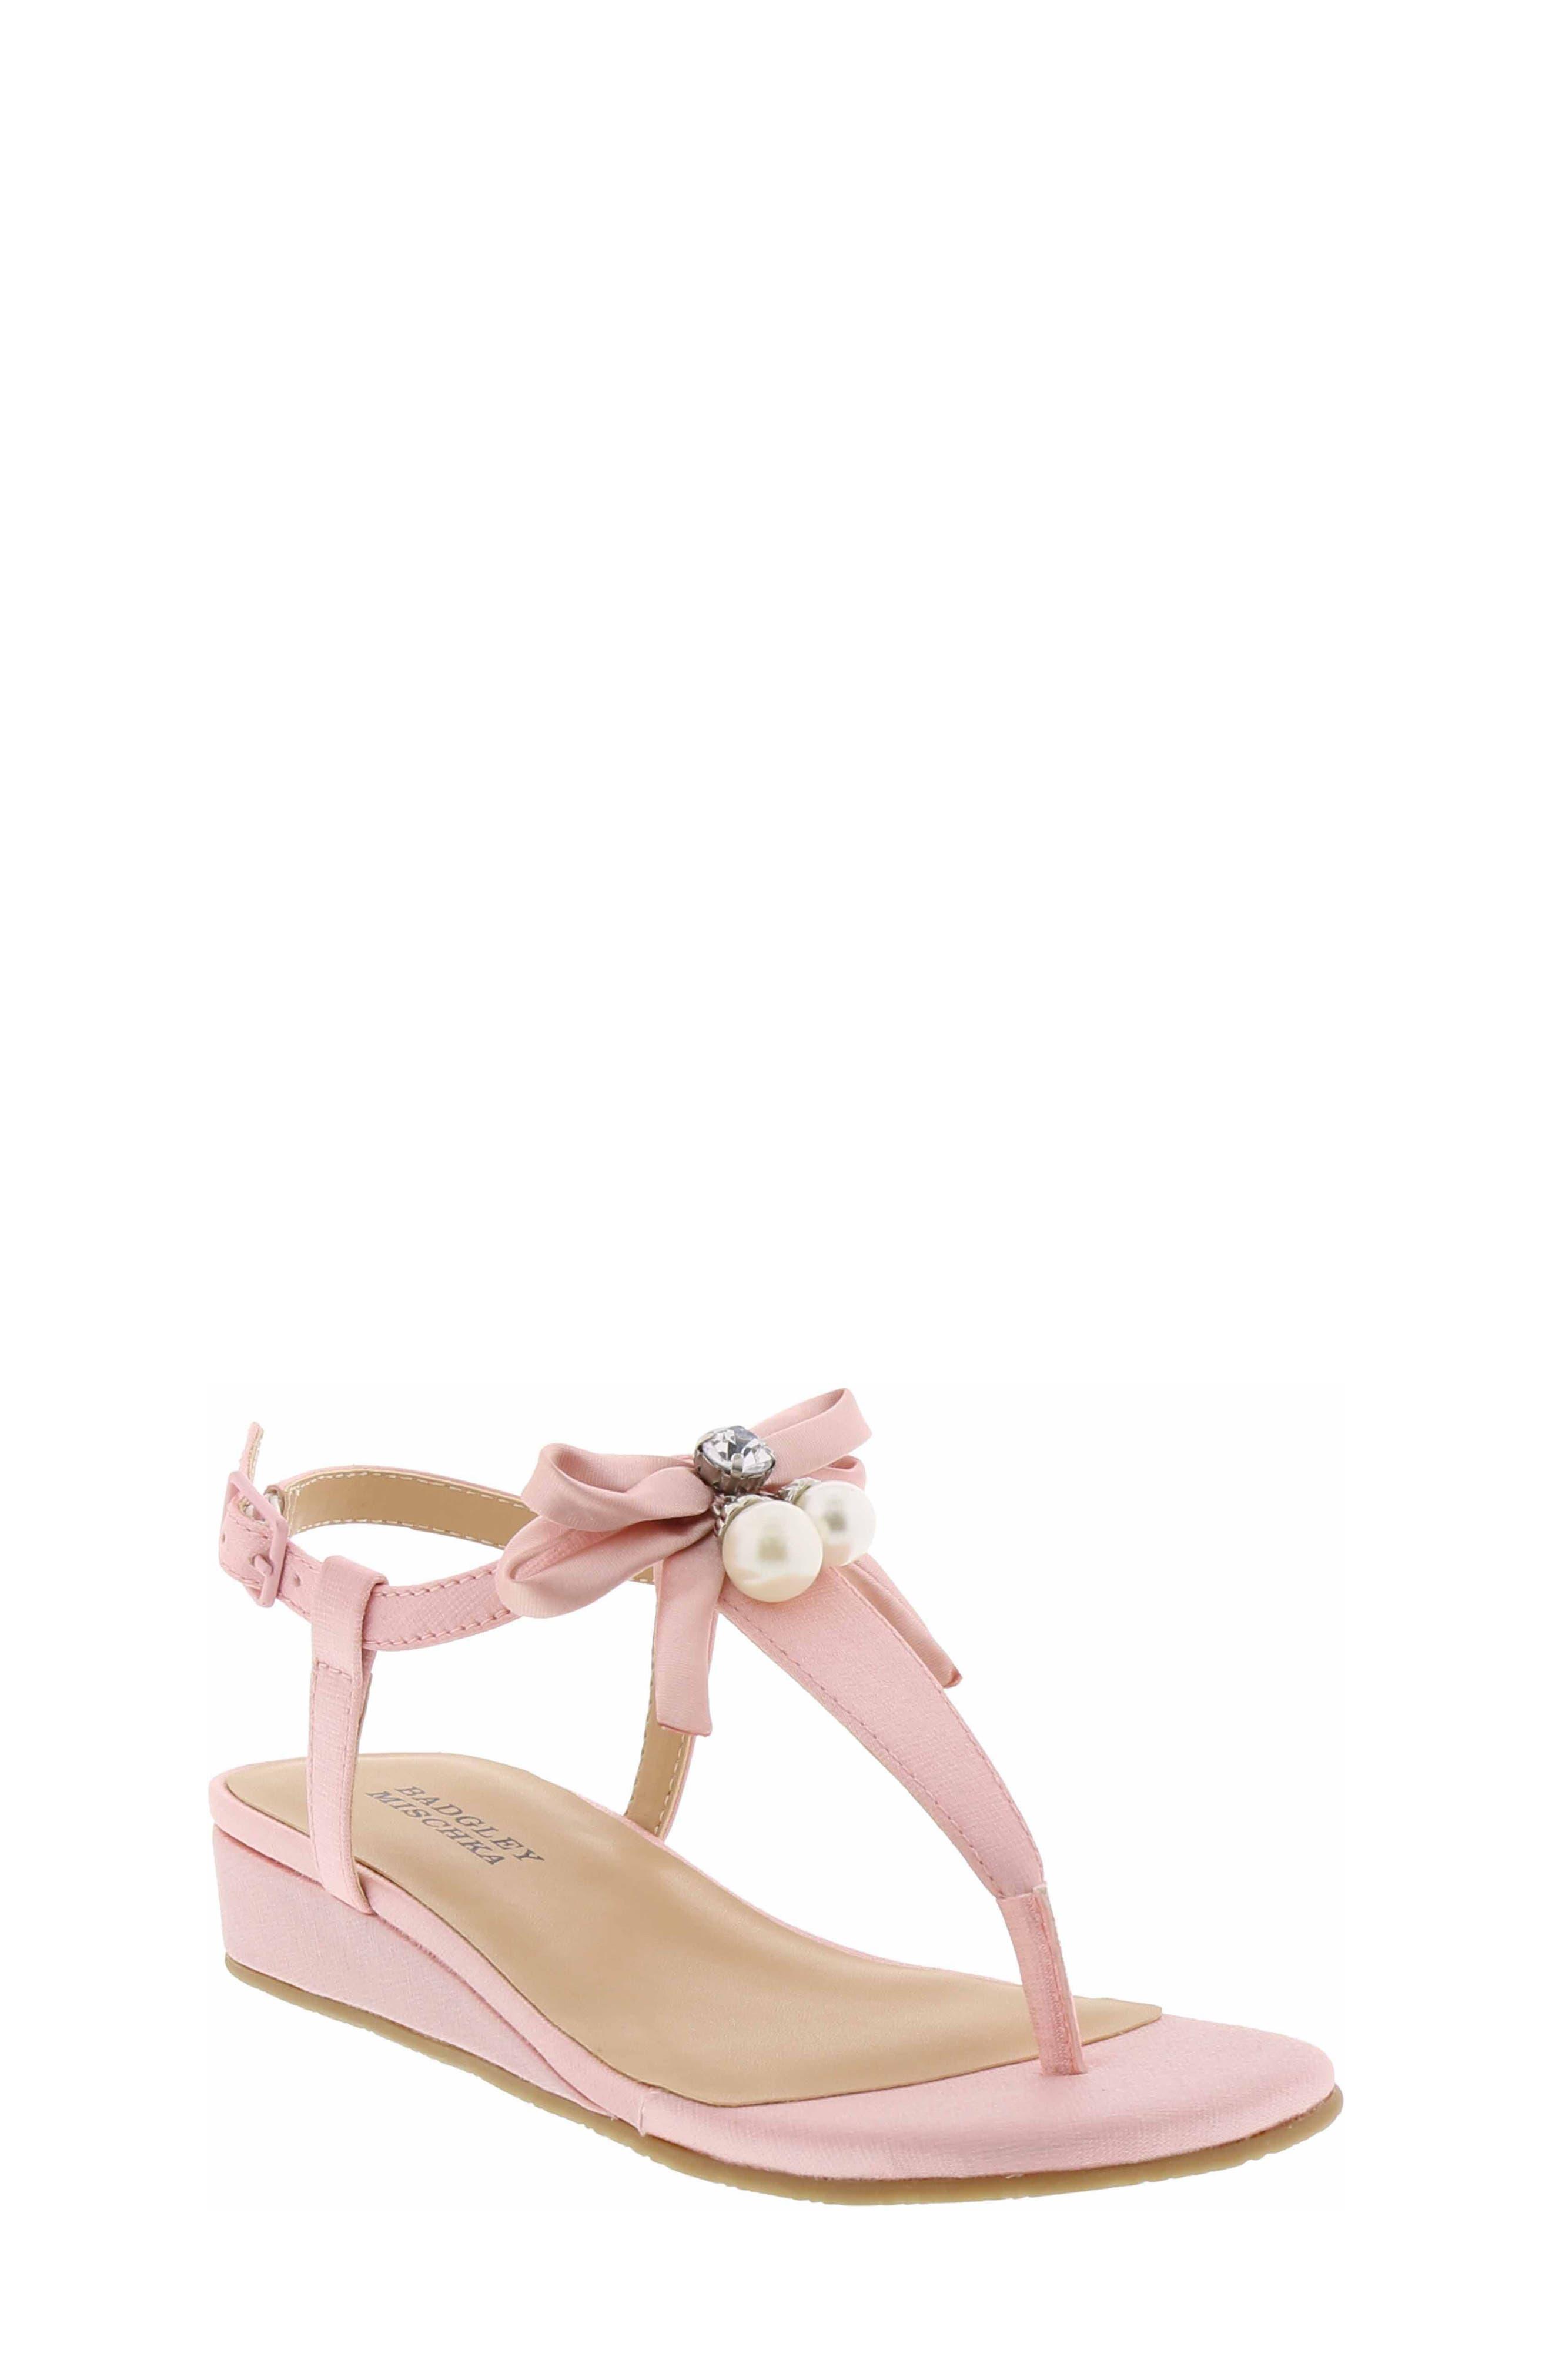 Talia Embellished Bow Sandal,                             Main thumbnail 1, color,                             Light Pink